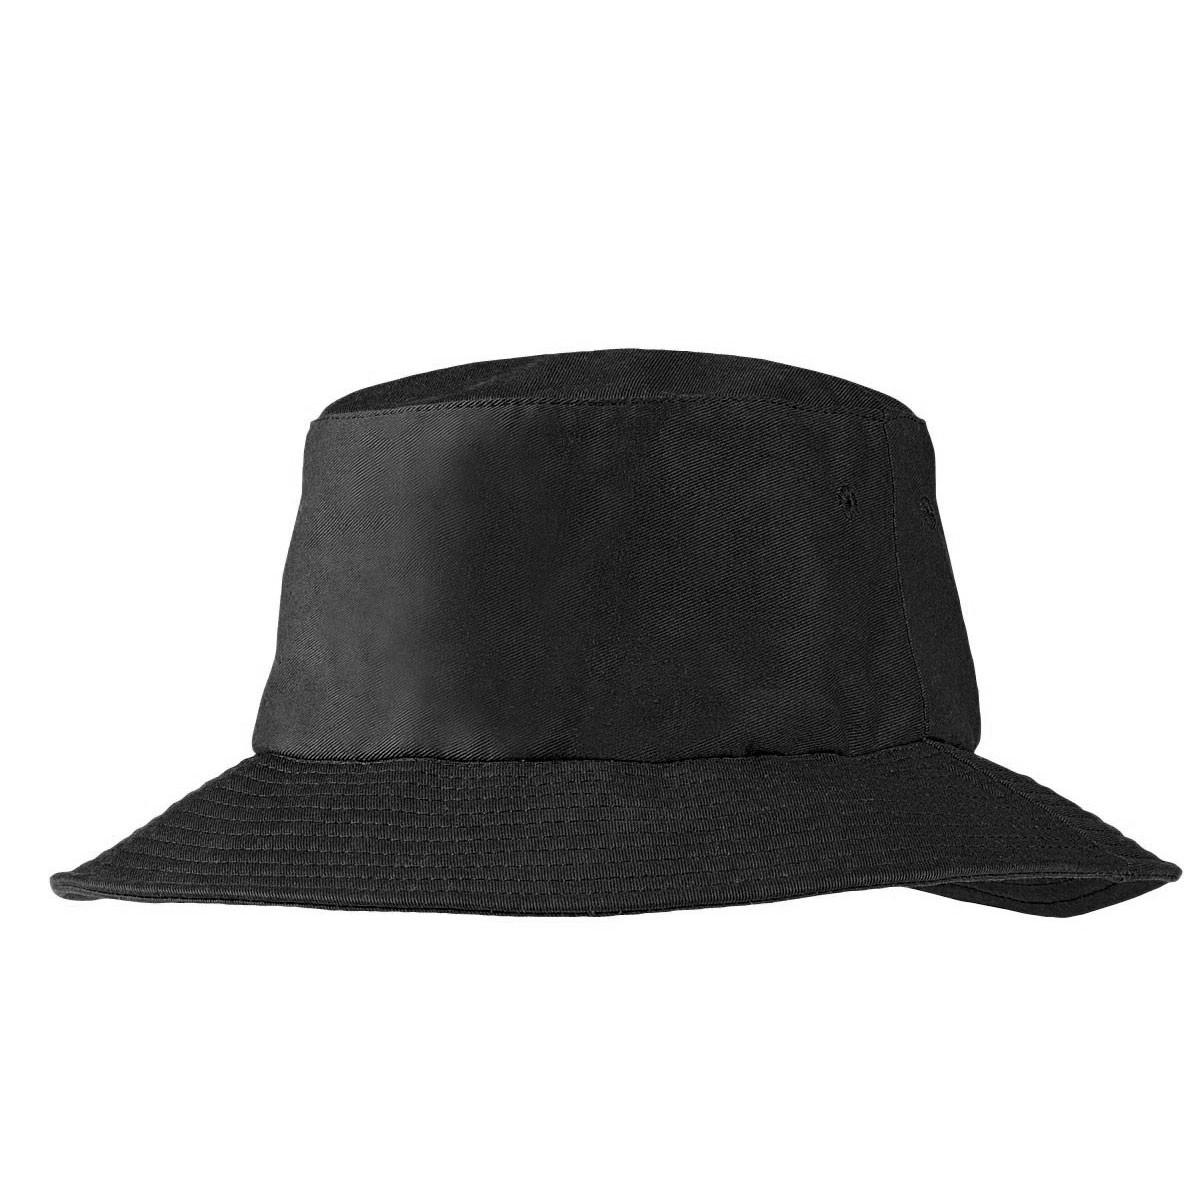 school bucket hats  0f99b67b51c